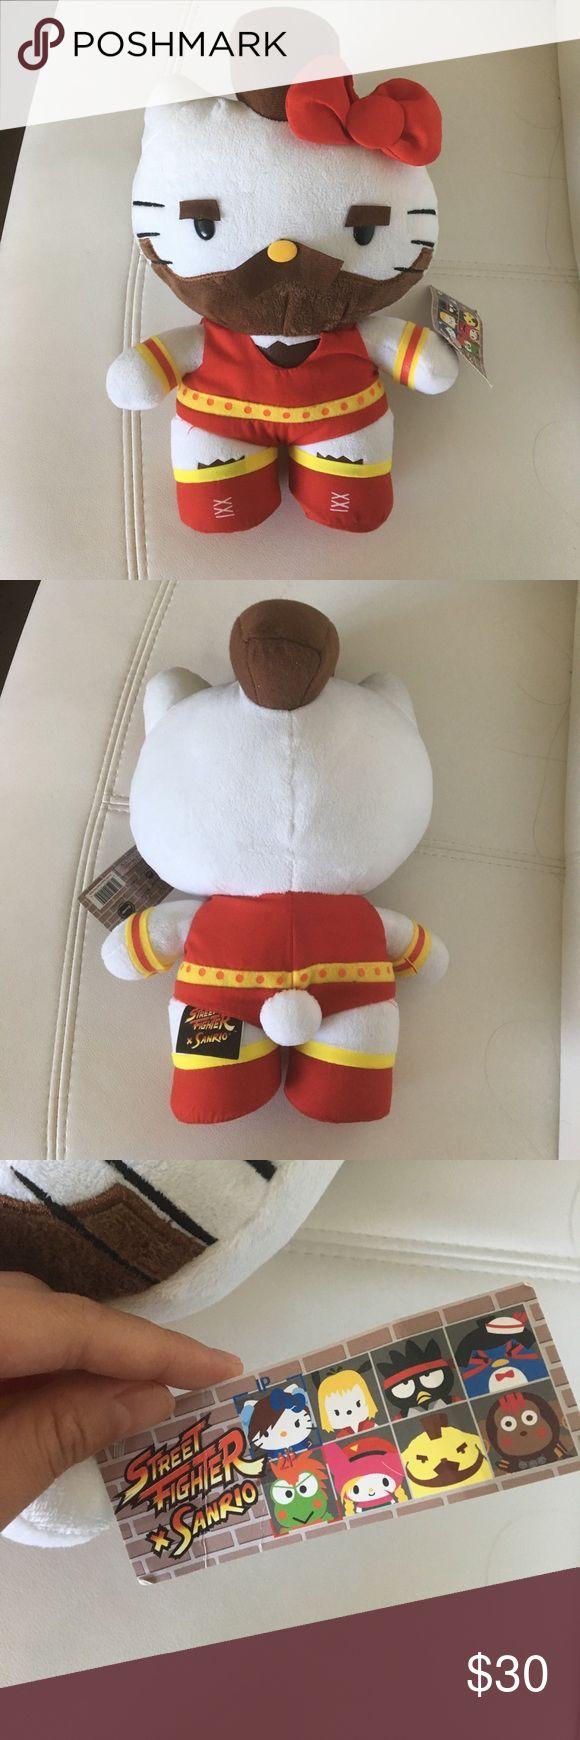 NWT Hello Kitty Street Fighter Plush Brand new stuffed animal. Street fighter Hello Kitty. 11 inches. Hello Kitty Other